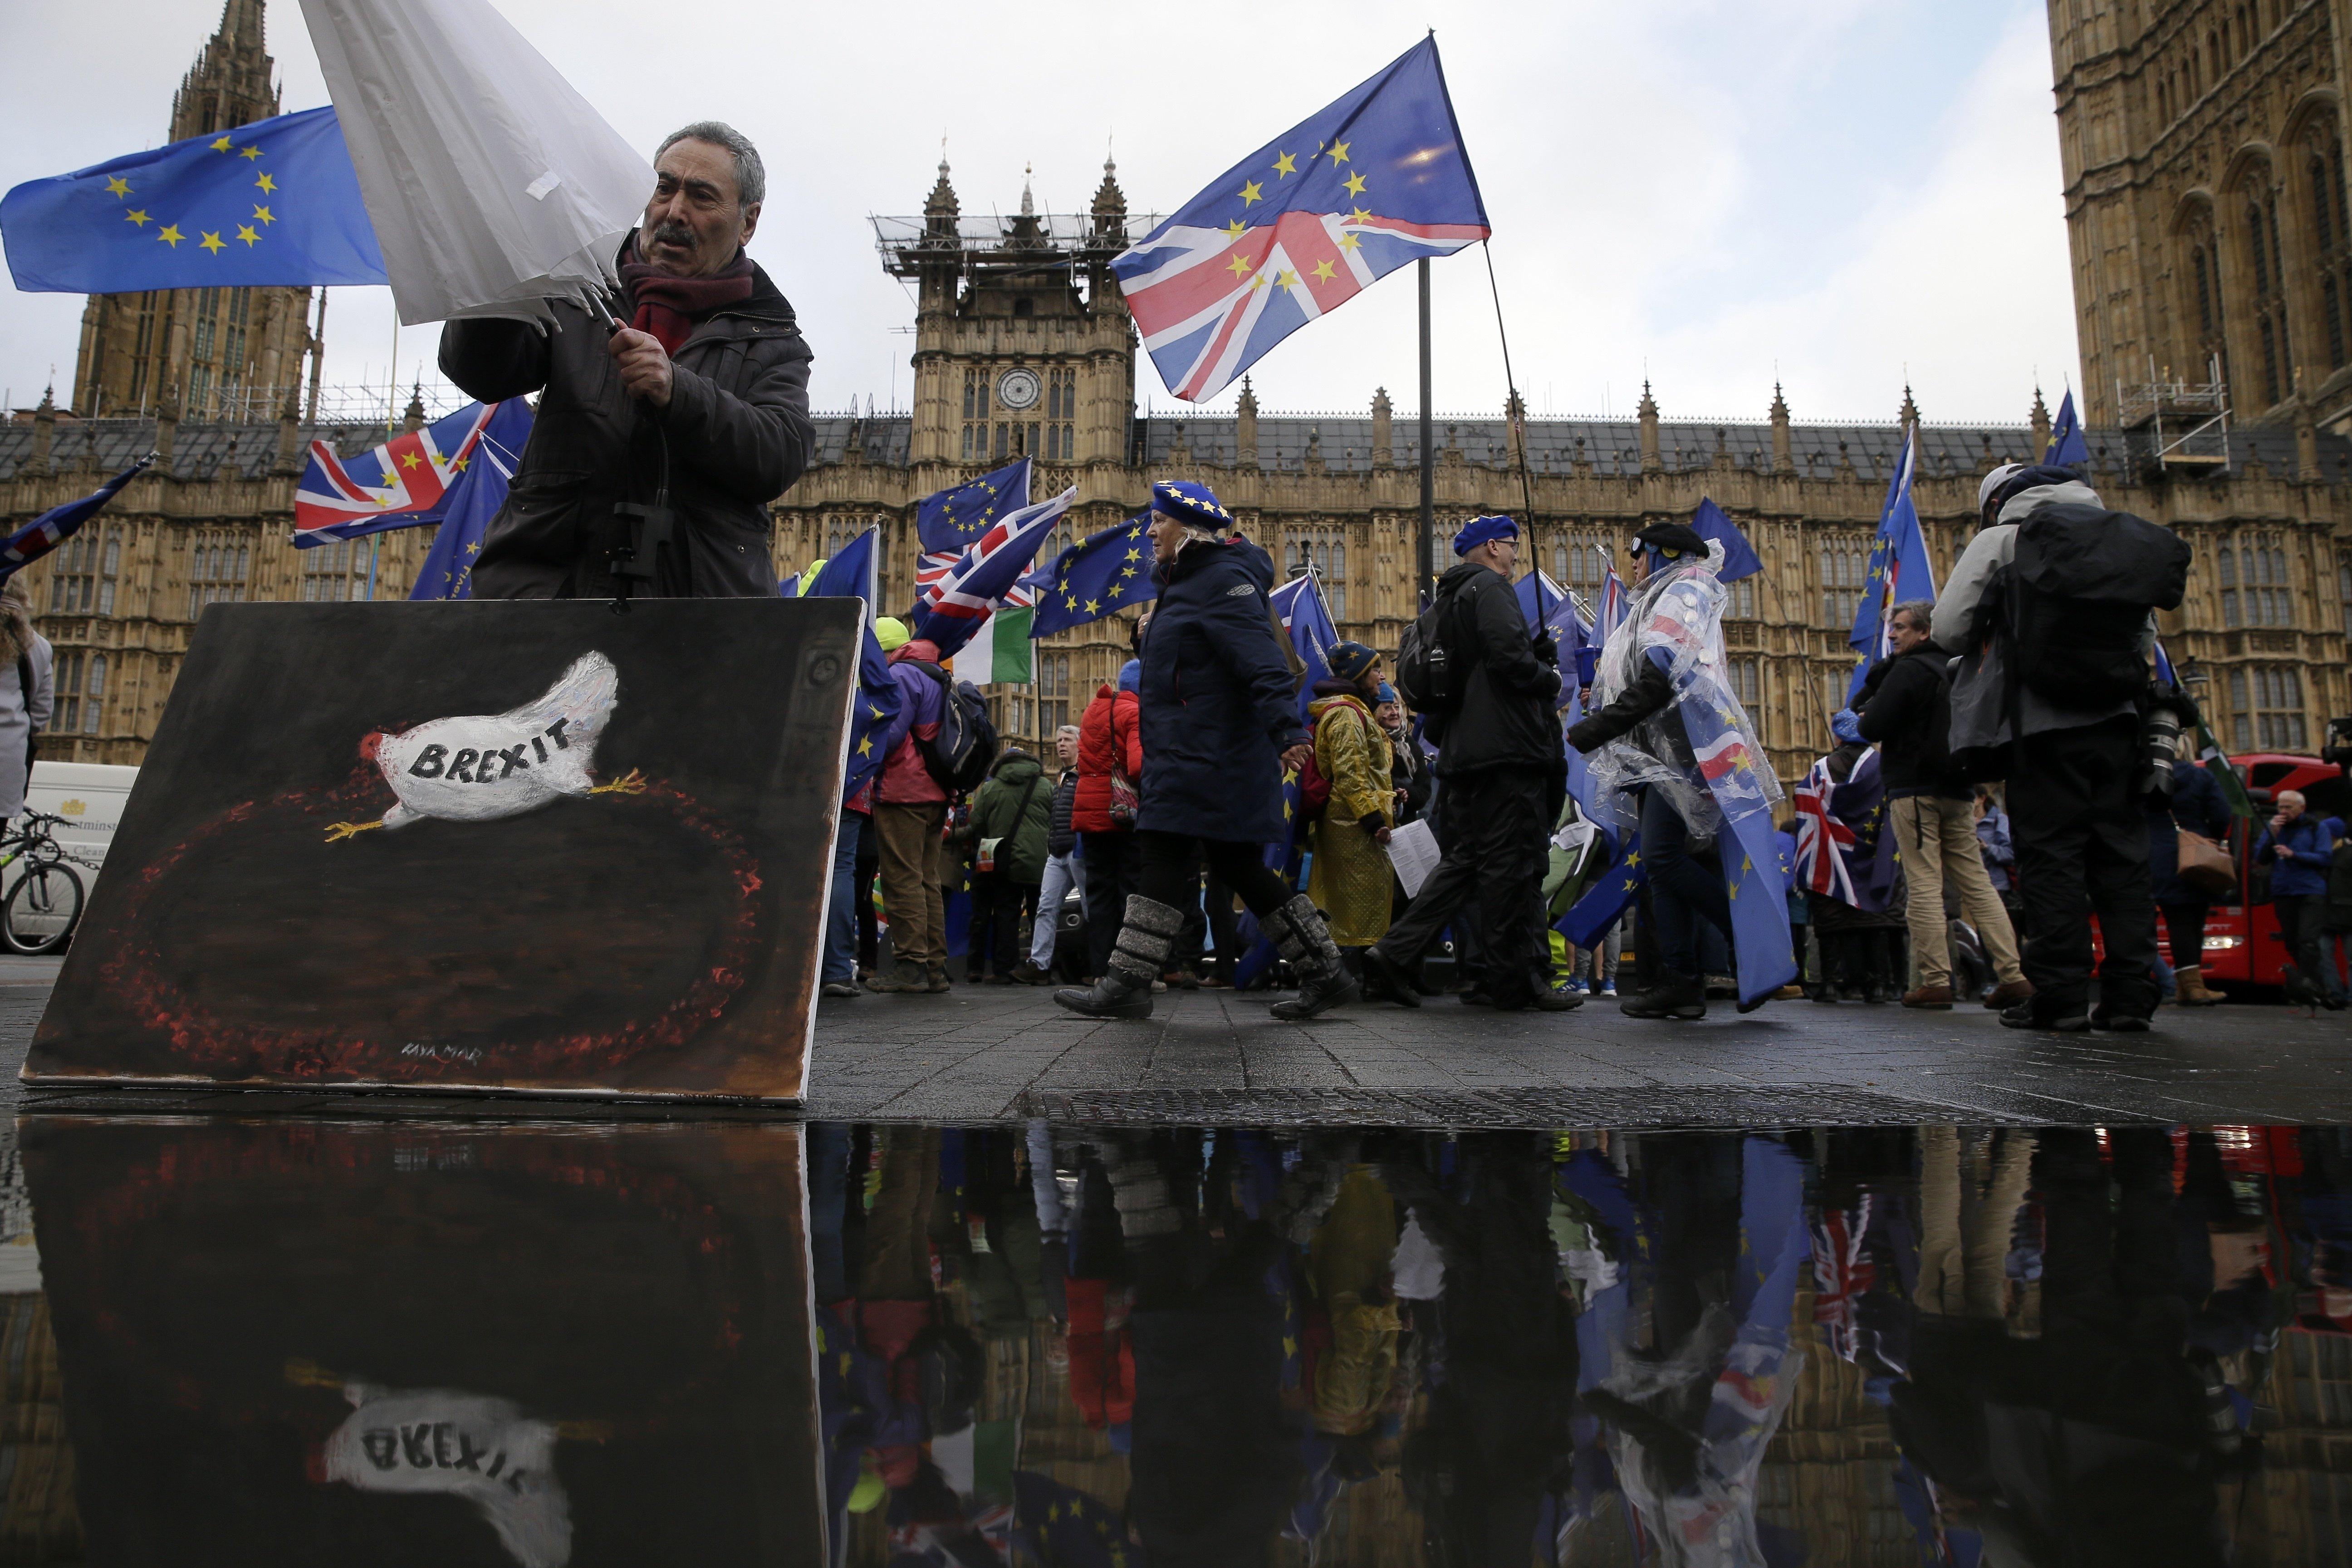 Brexit: Ακυβέρνητο καράβι η Βρετανία - Σε δεινή θέση η Τερέζα